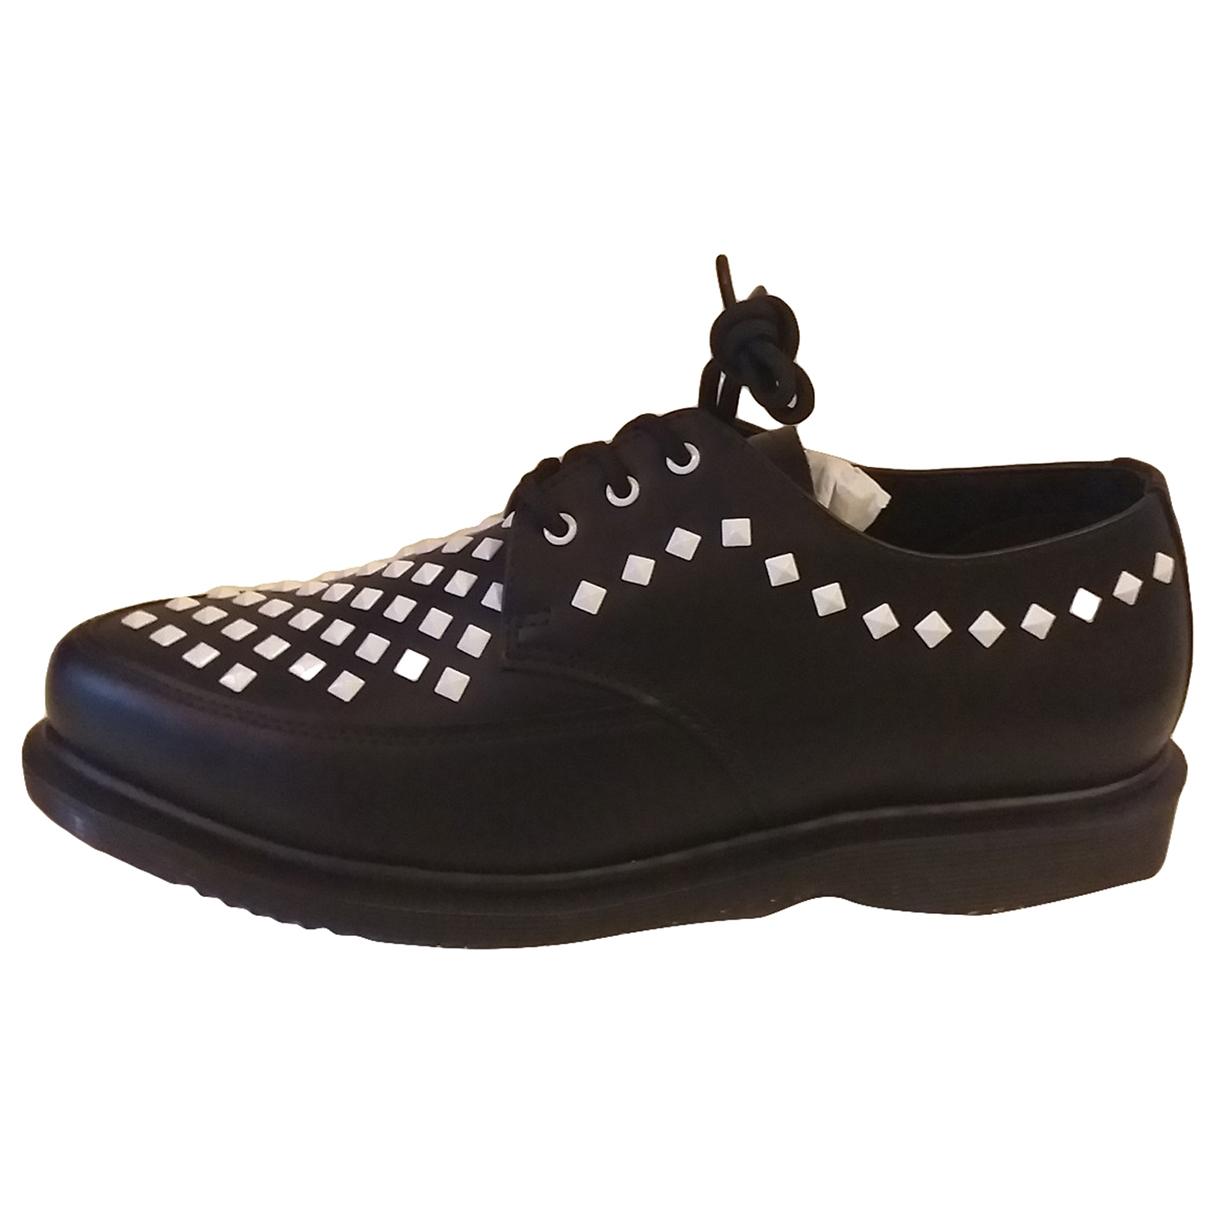 Dr. Martens \N Black Leather Flats for Women 38 EU